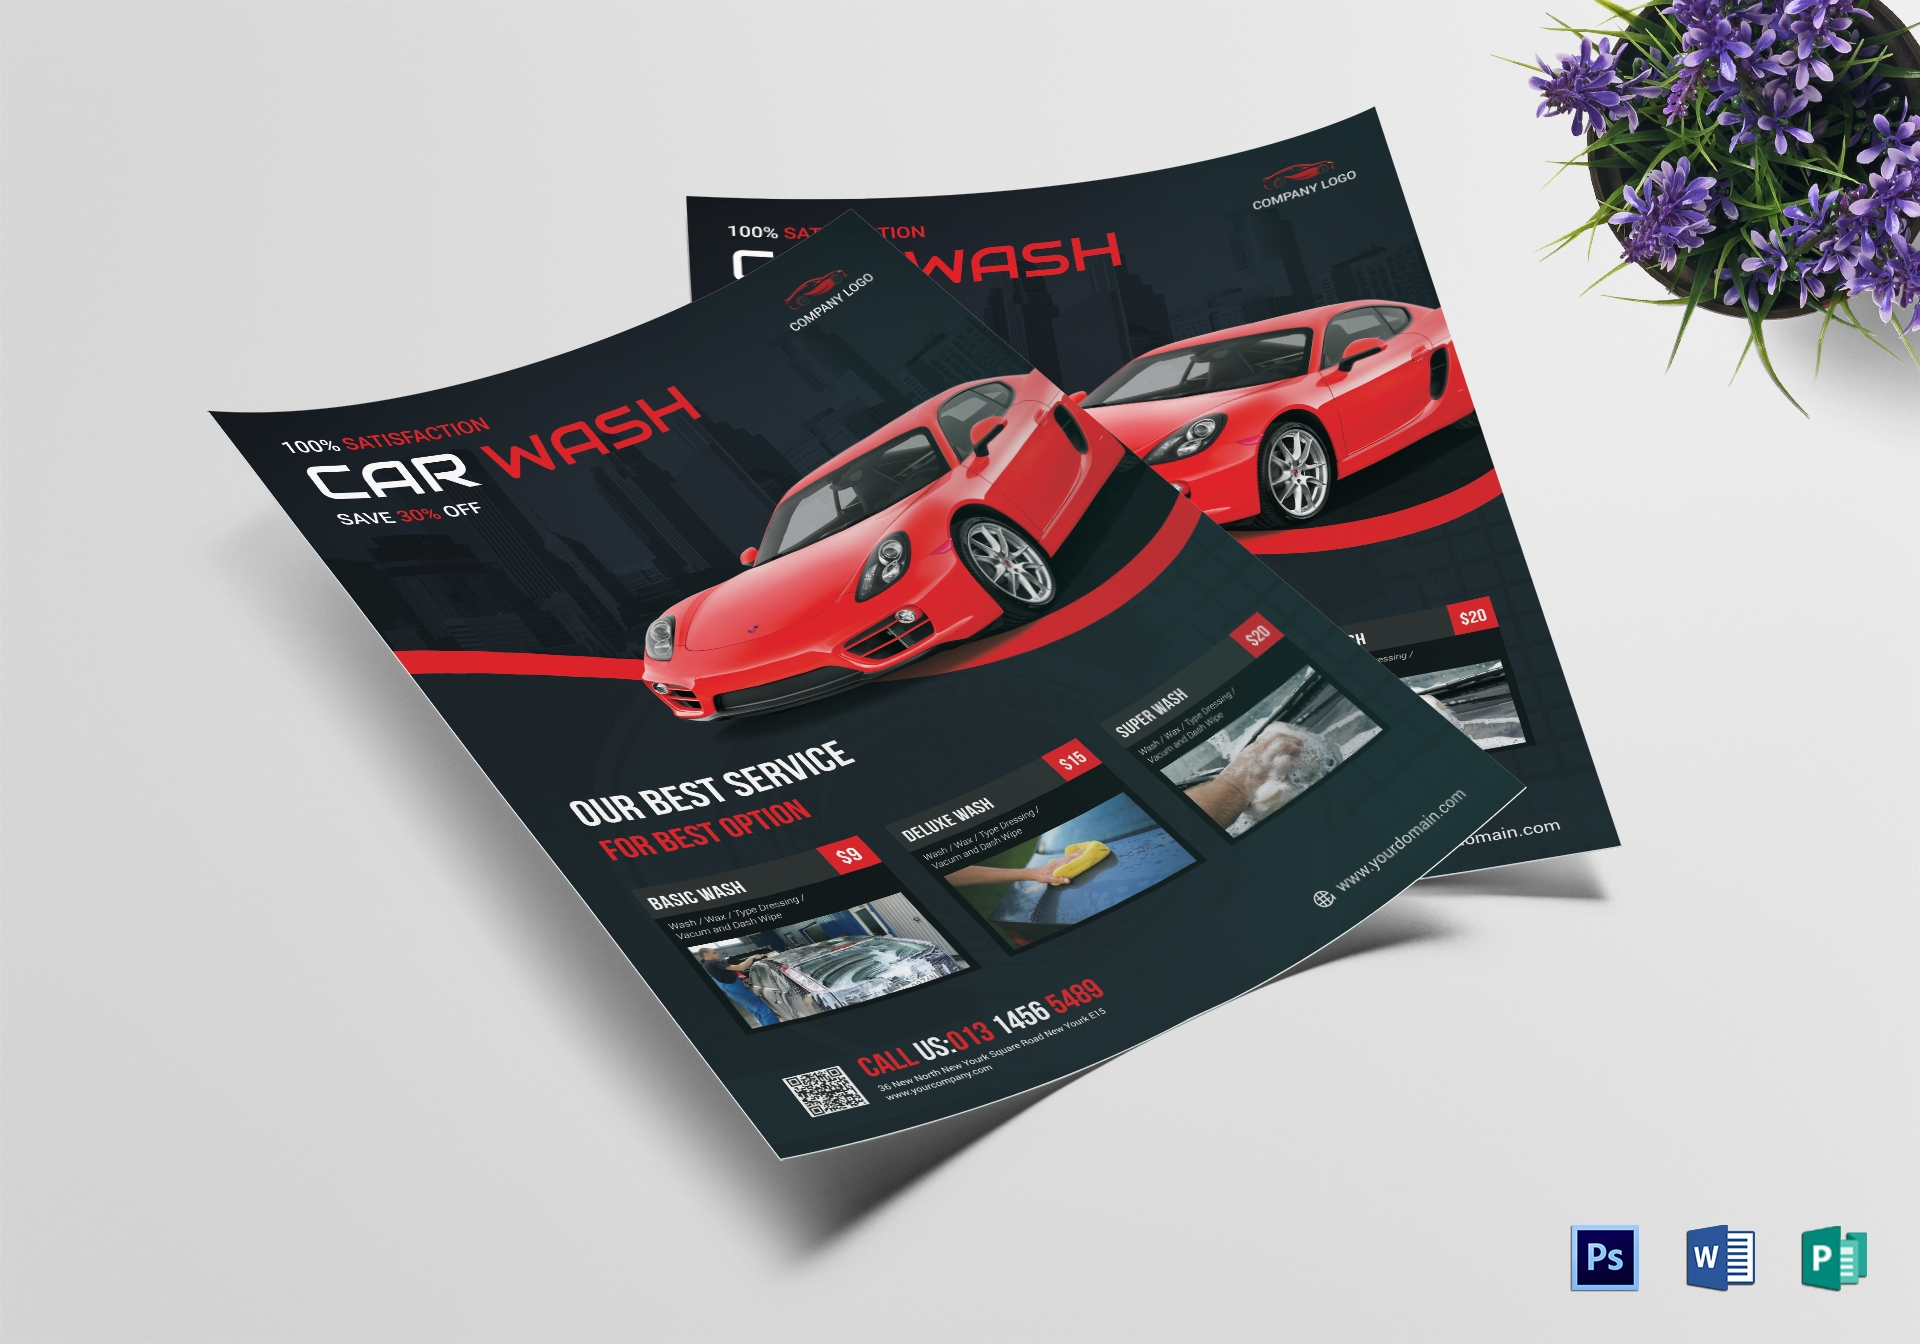 best car wash service flyer